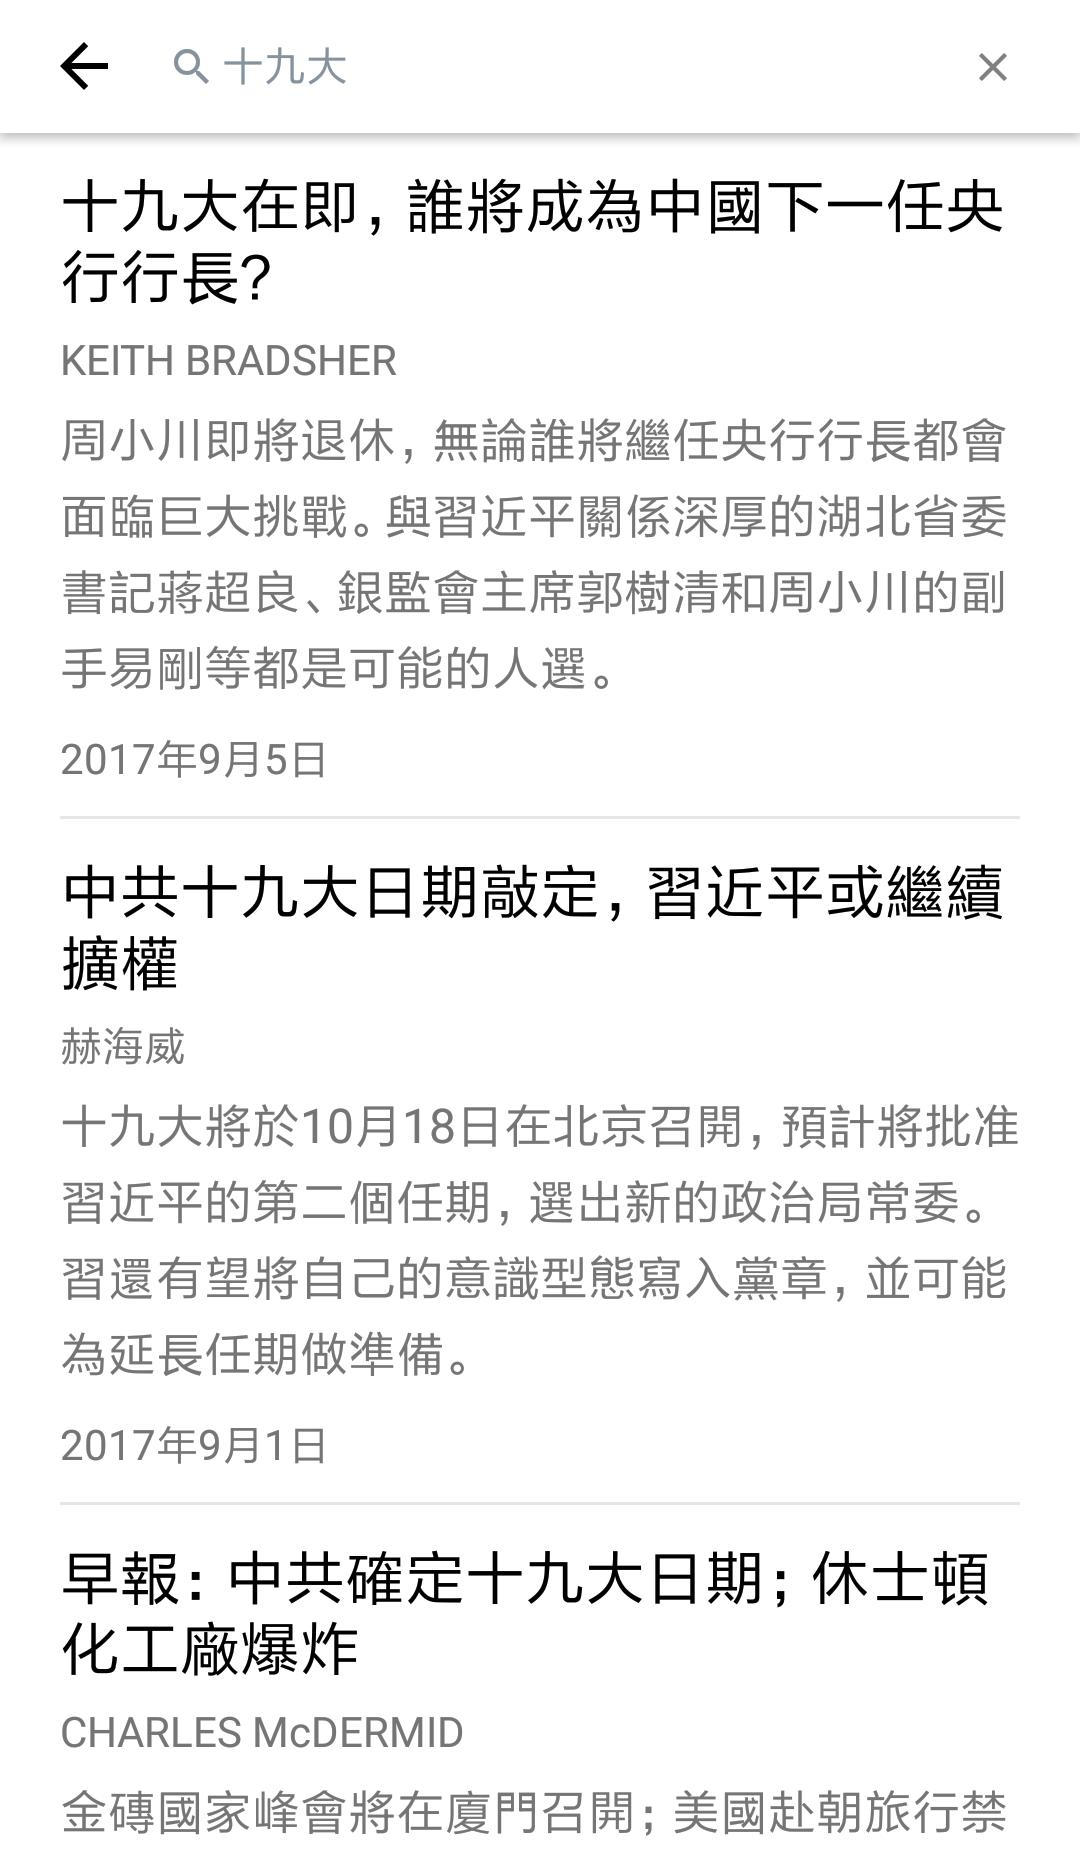 NYTimes - Chinese Edition 1.1.0.29 Screenshot 7